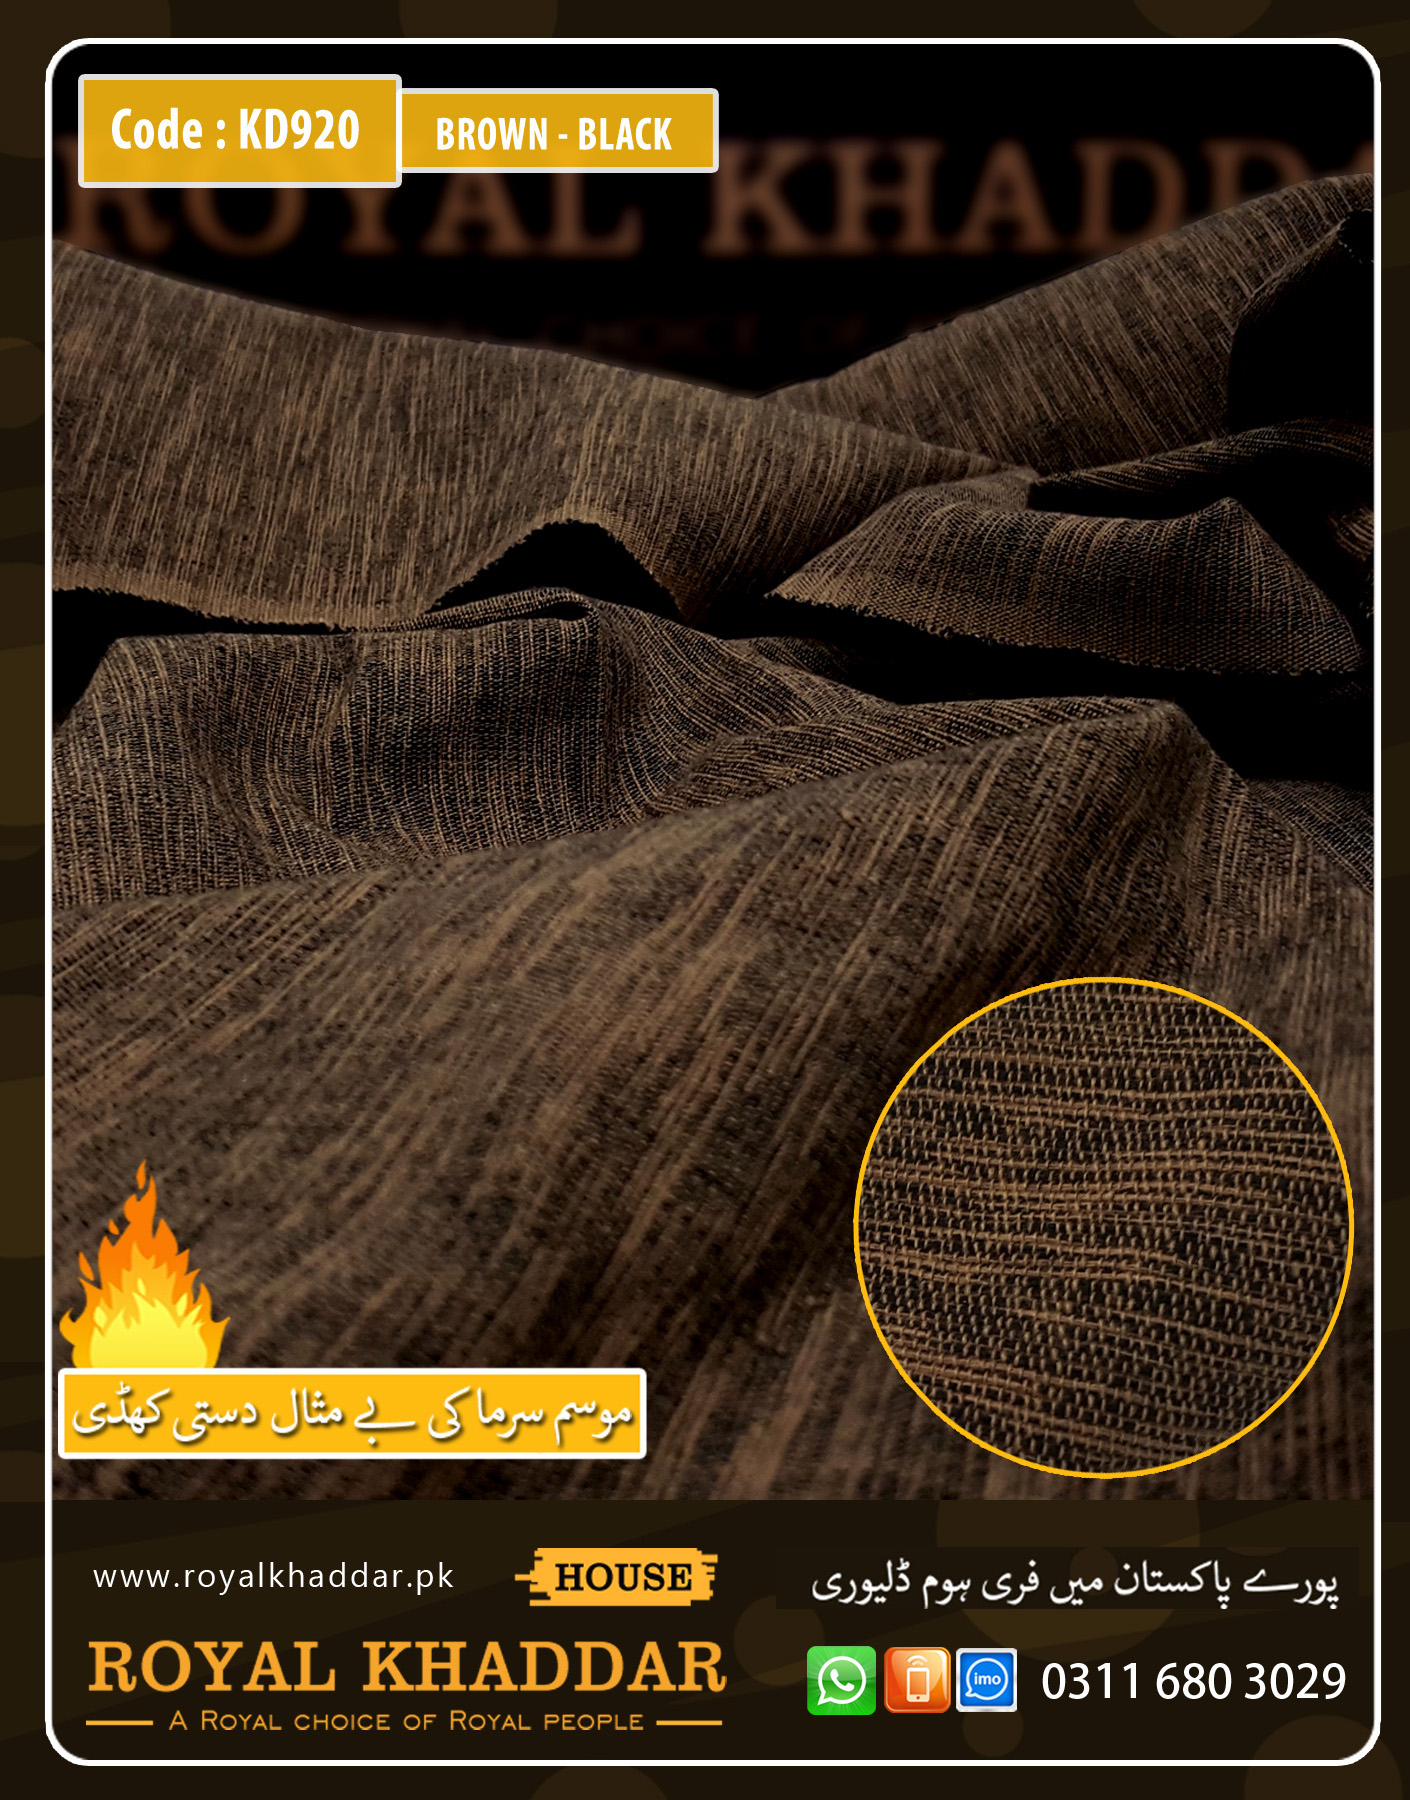 Brown - Black Handmade Khaddi